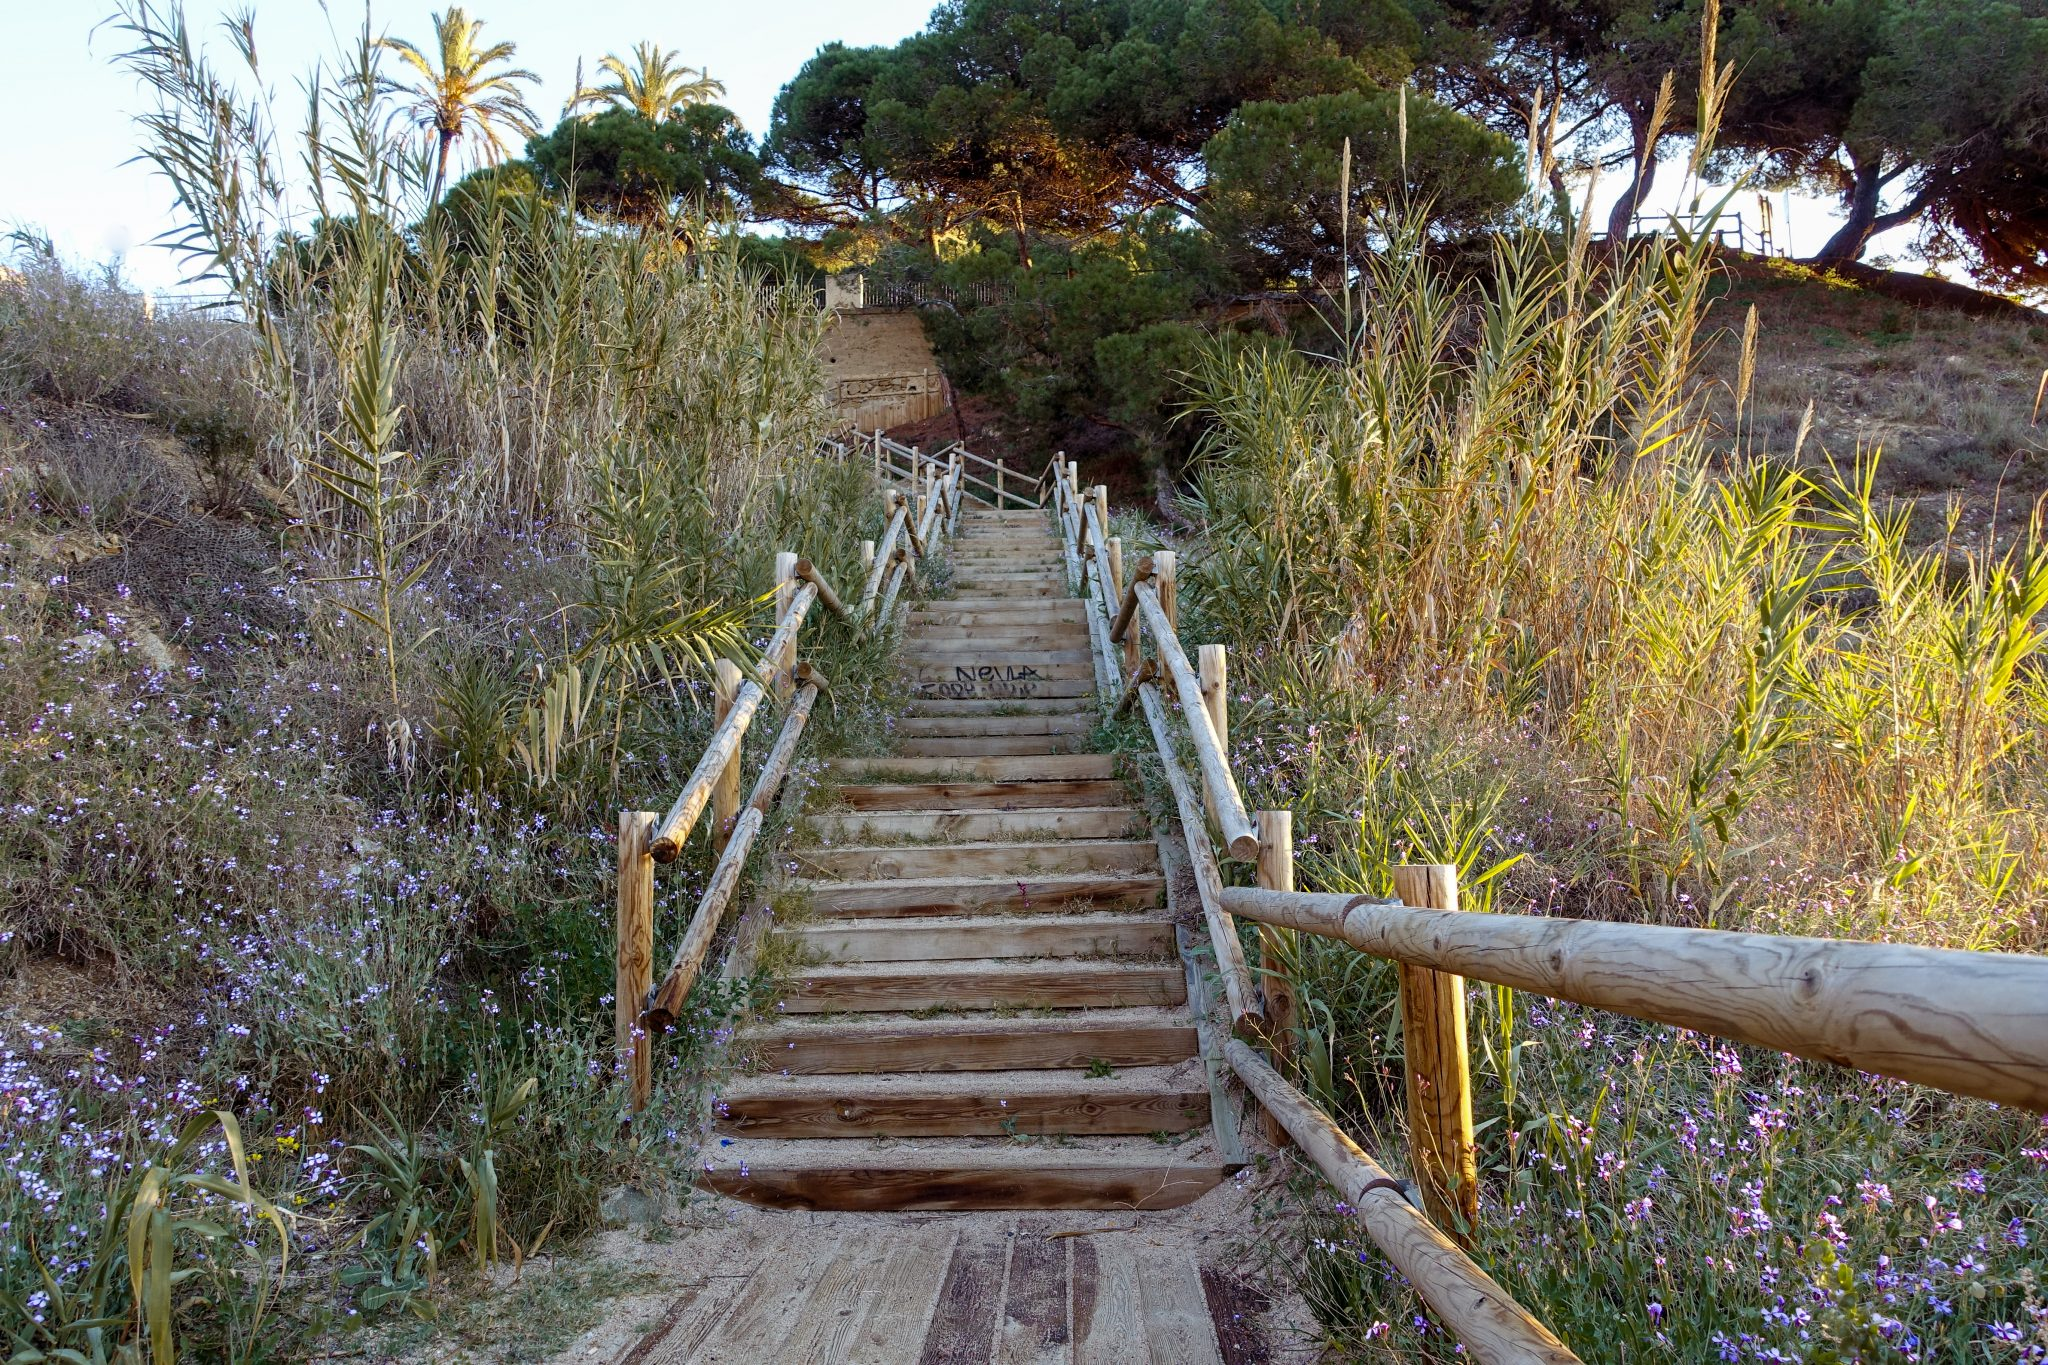 calella-travel-guide-winter-roca-grossa-treppe.jpg